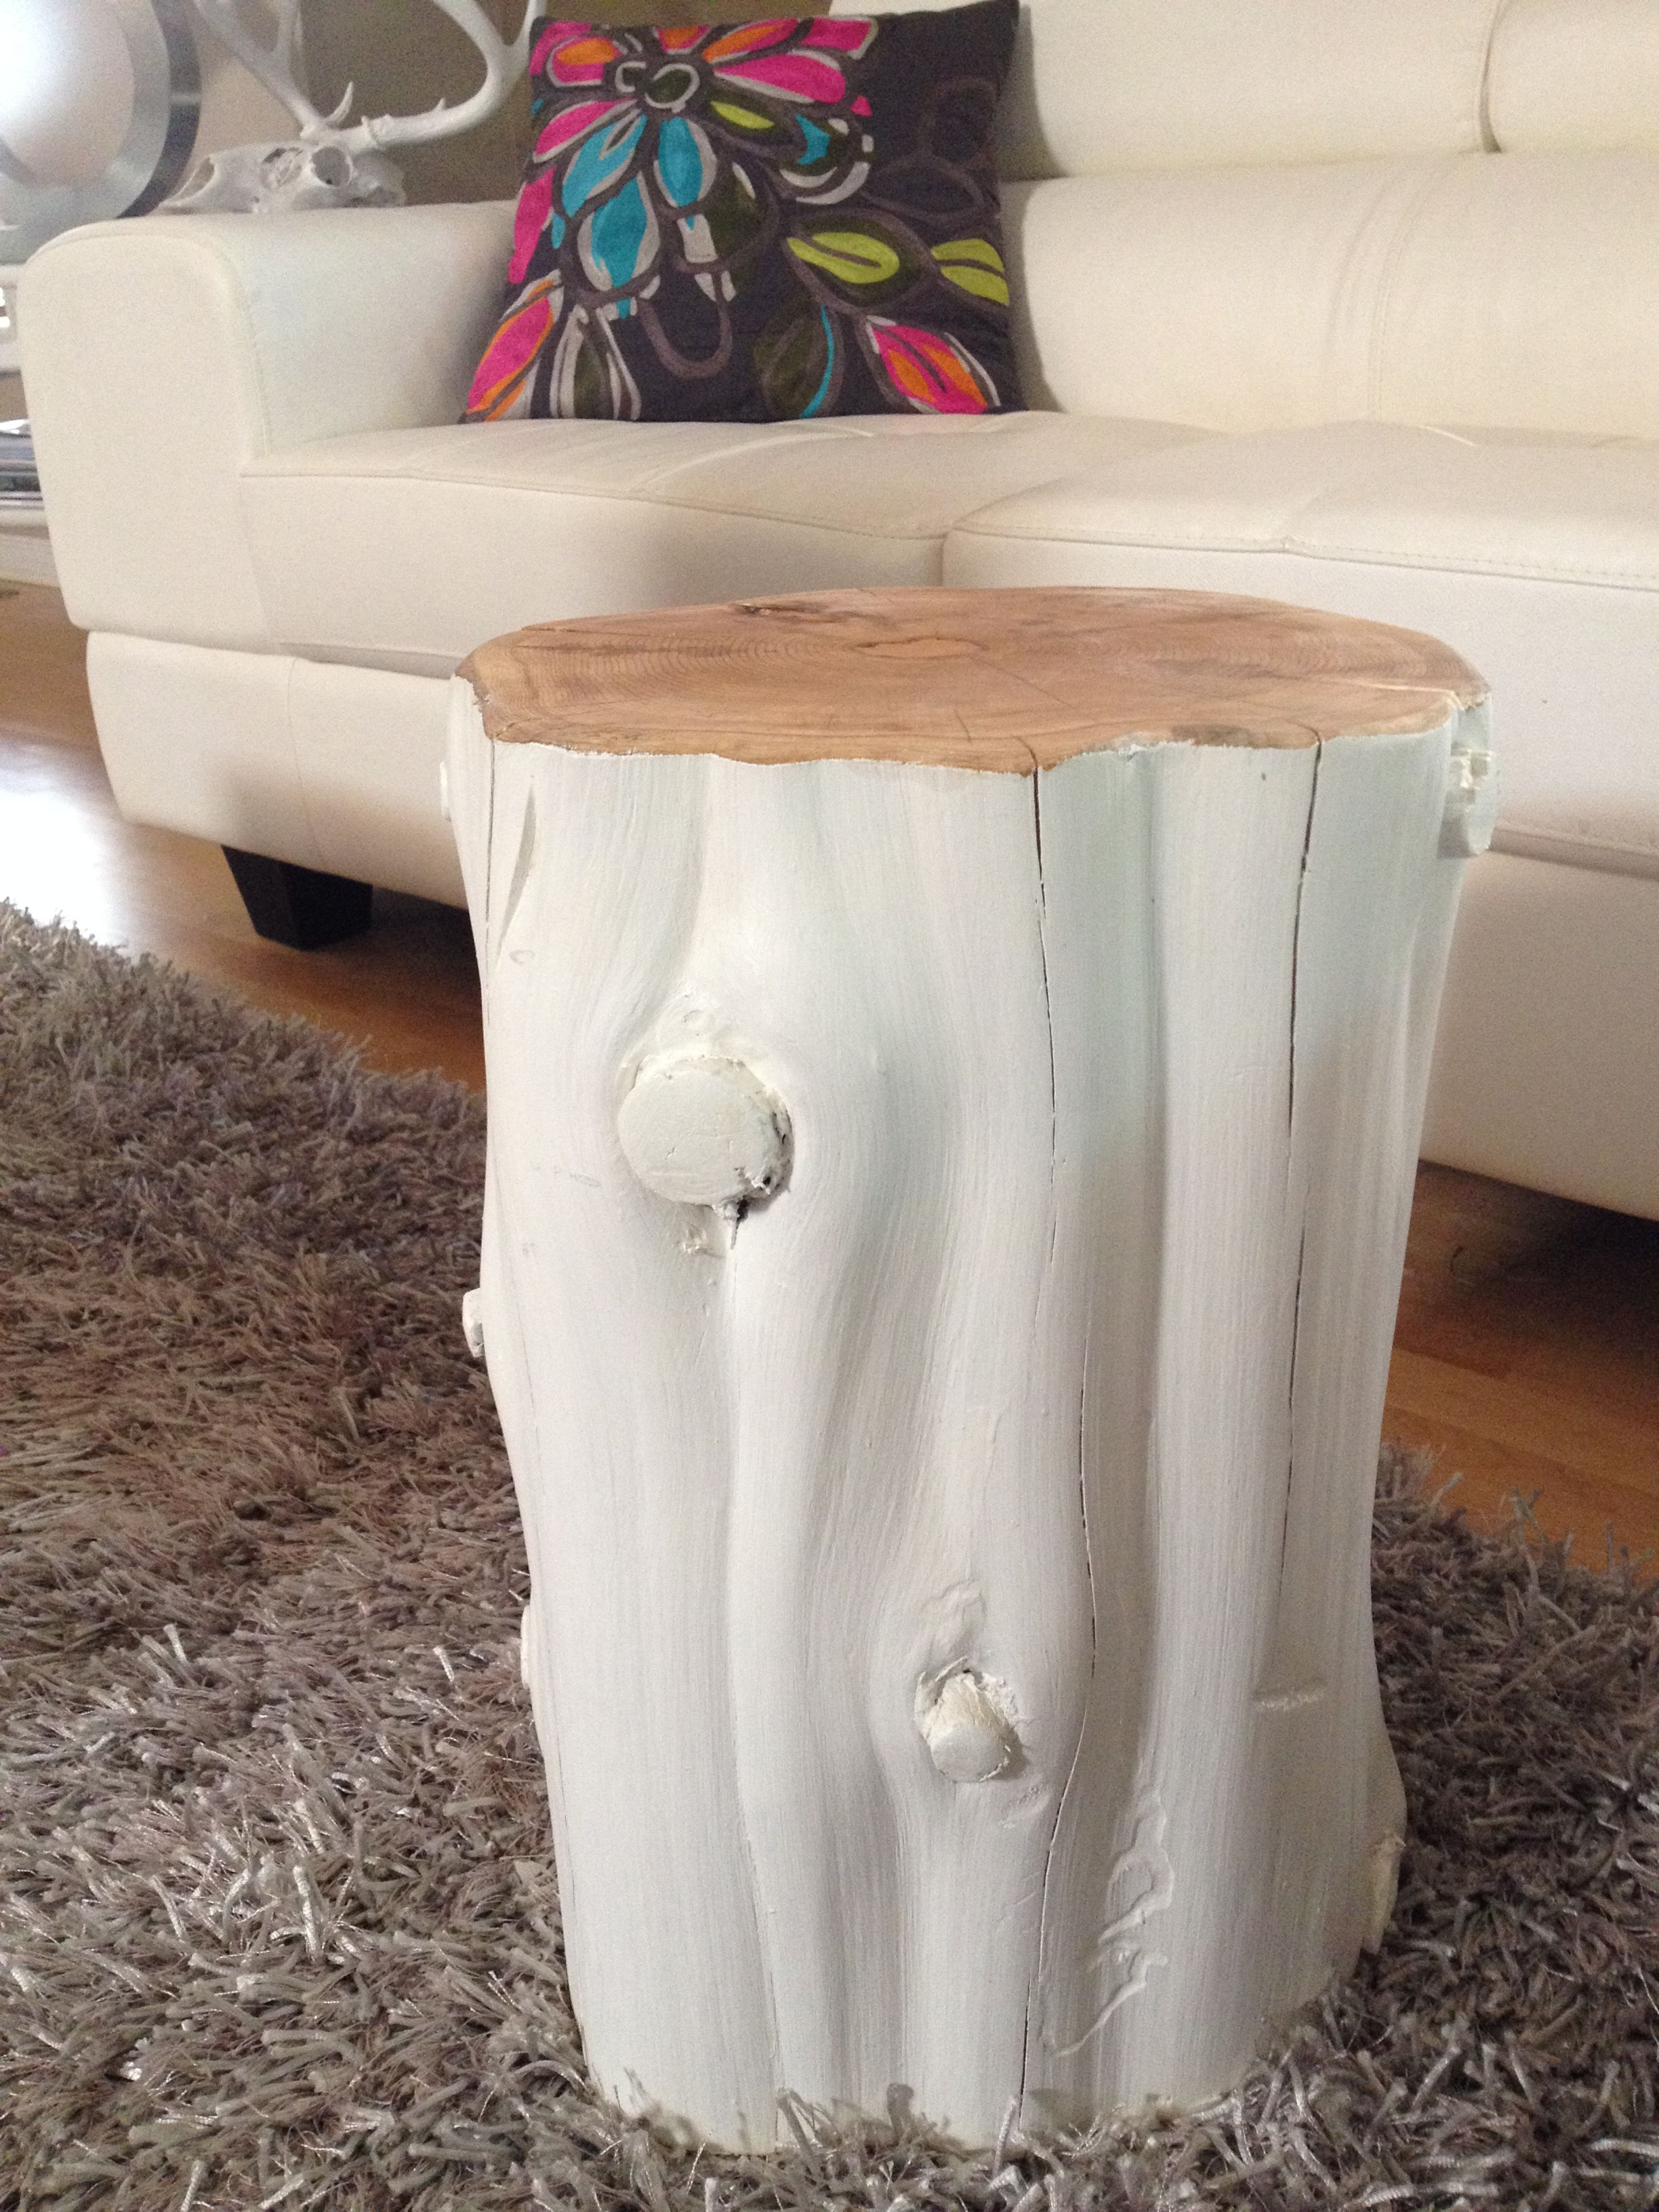 White stump tables Ottawa tario Canada Modern twist on stump